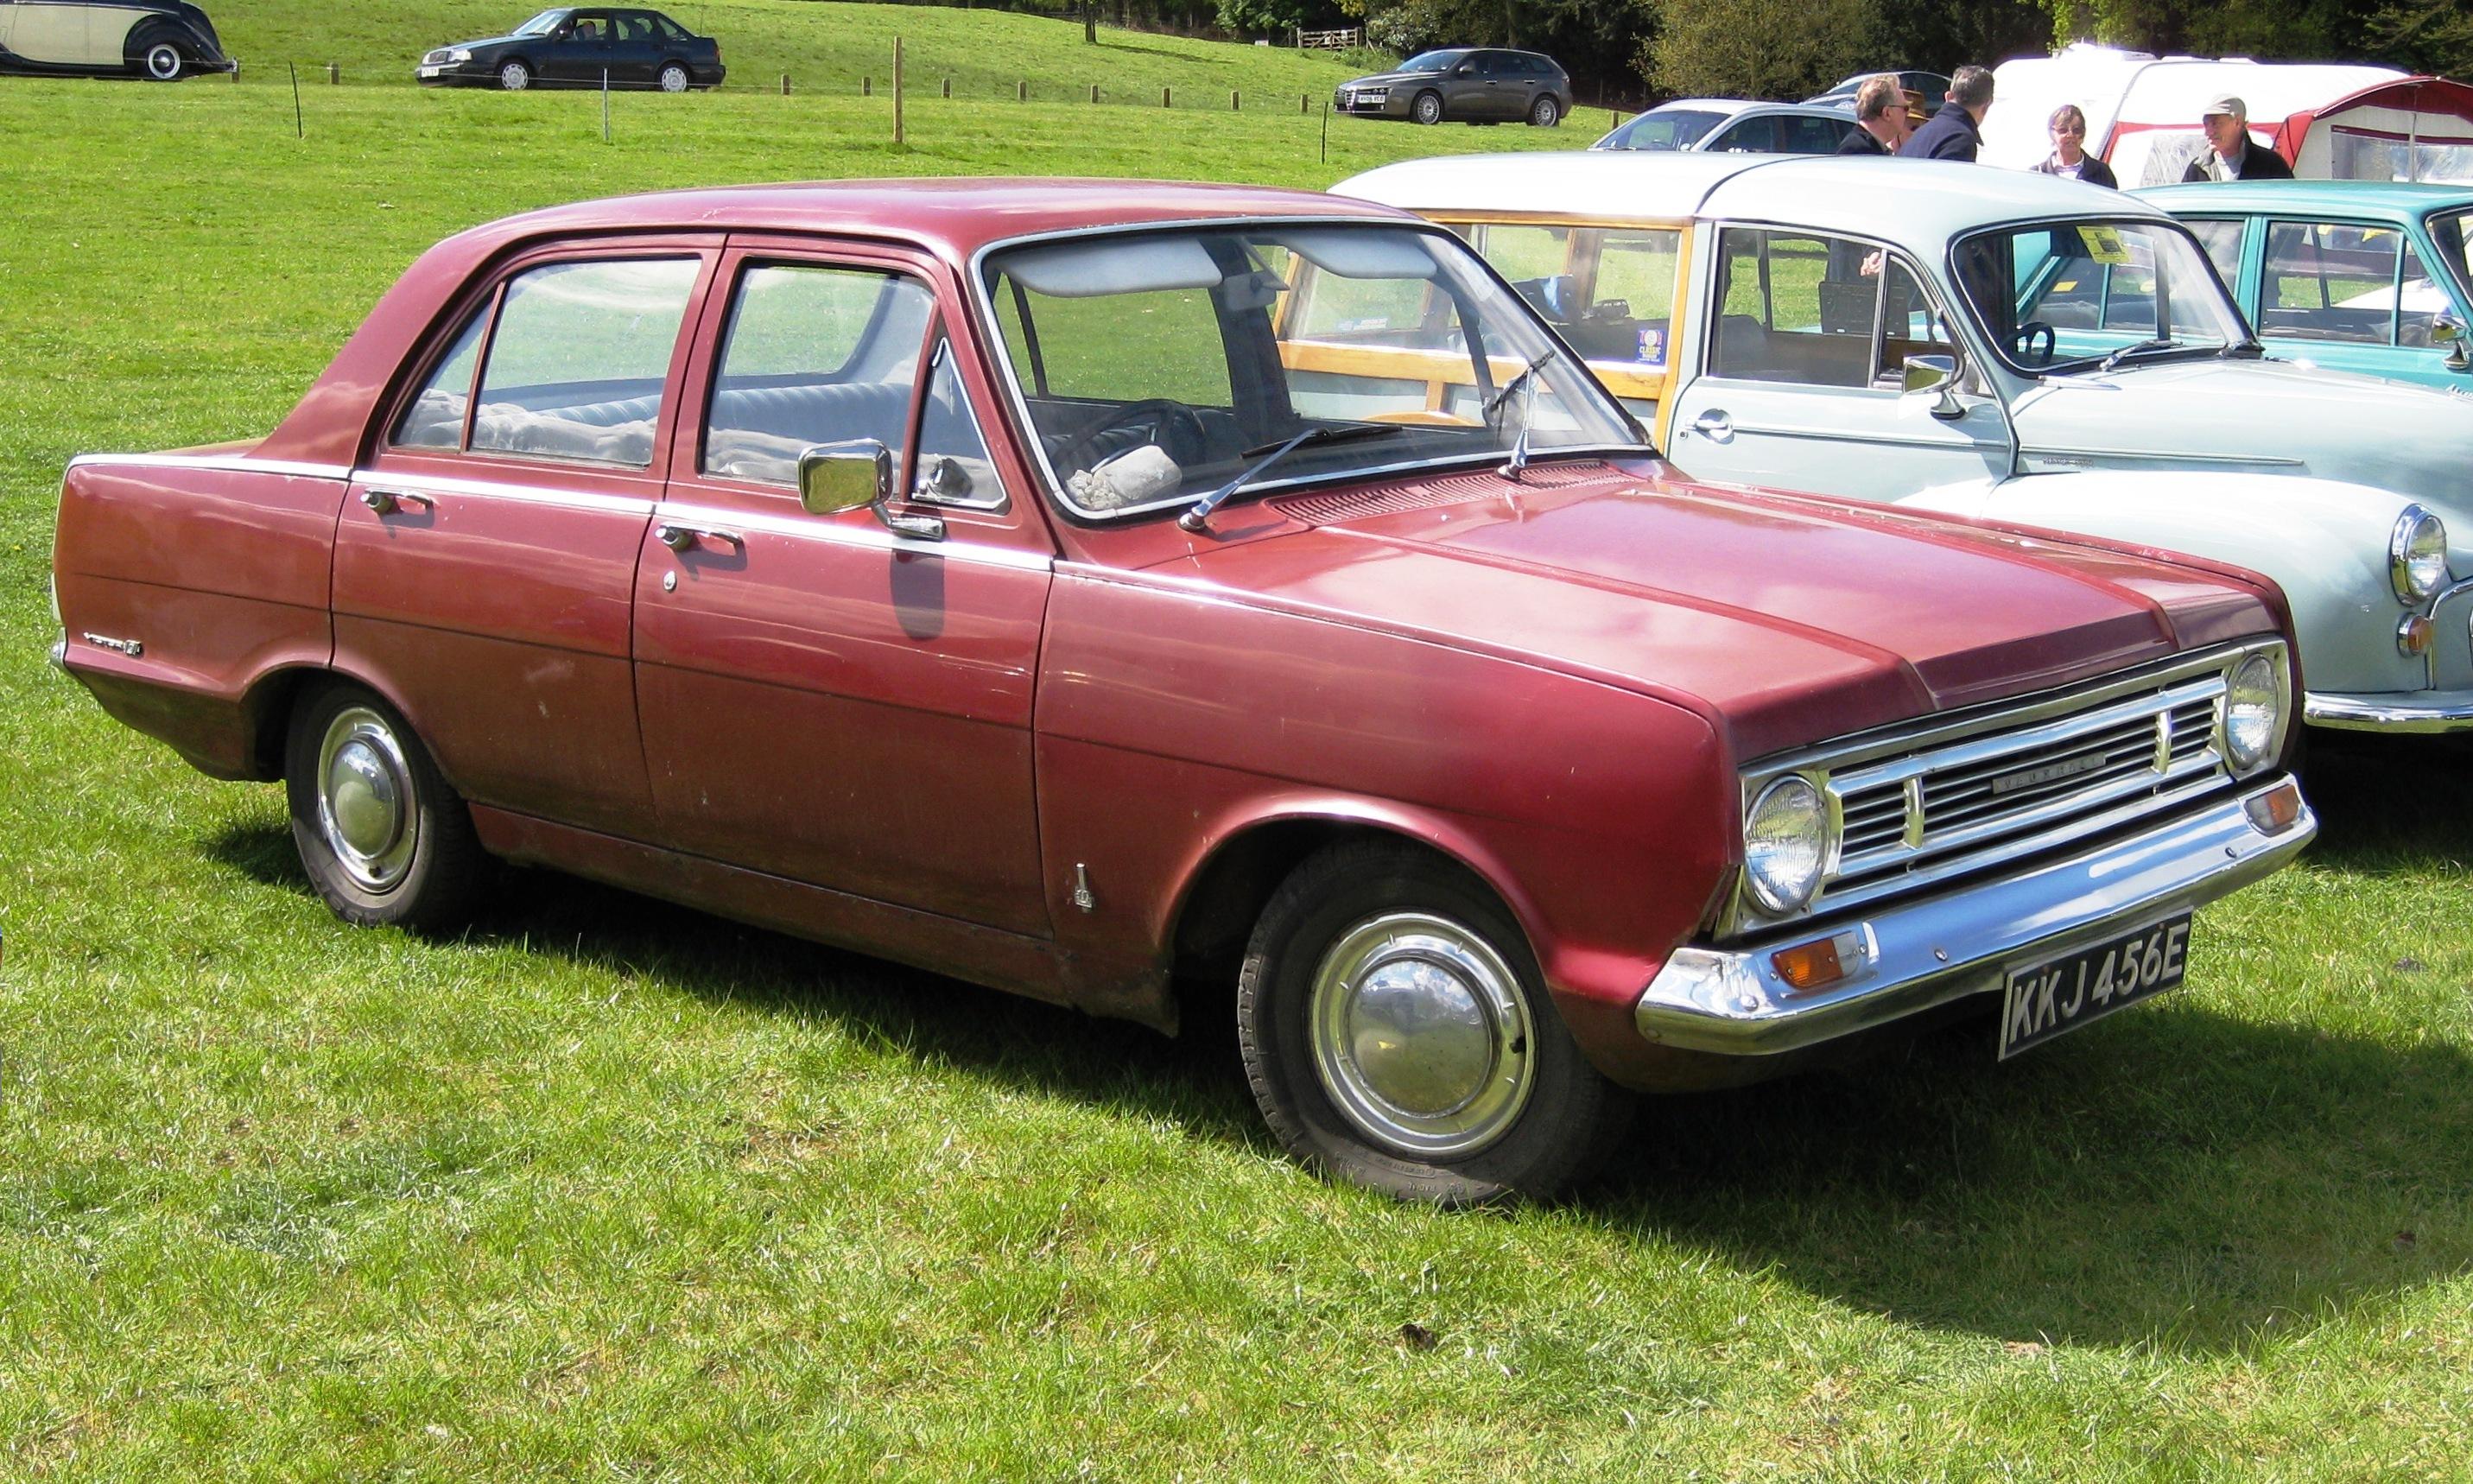 Vauxhall_Victor_101_FC_reg_May_1967_1594_cc.JPG